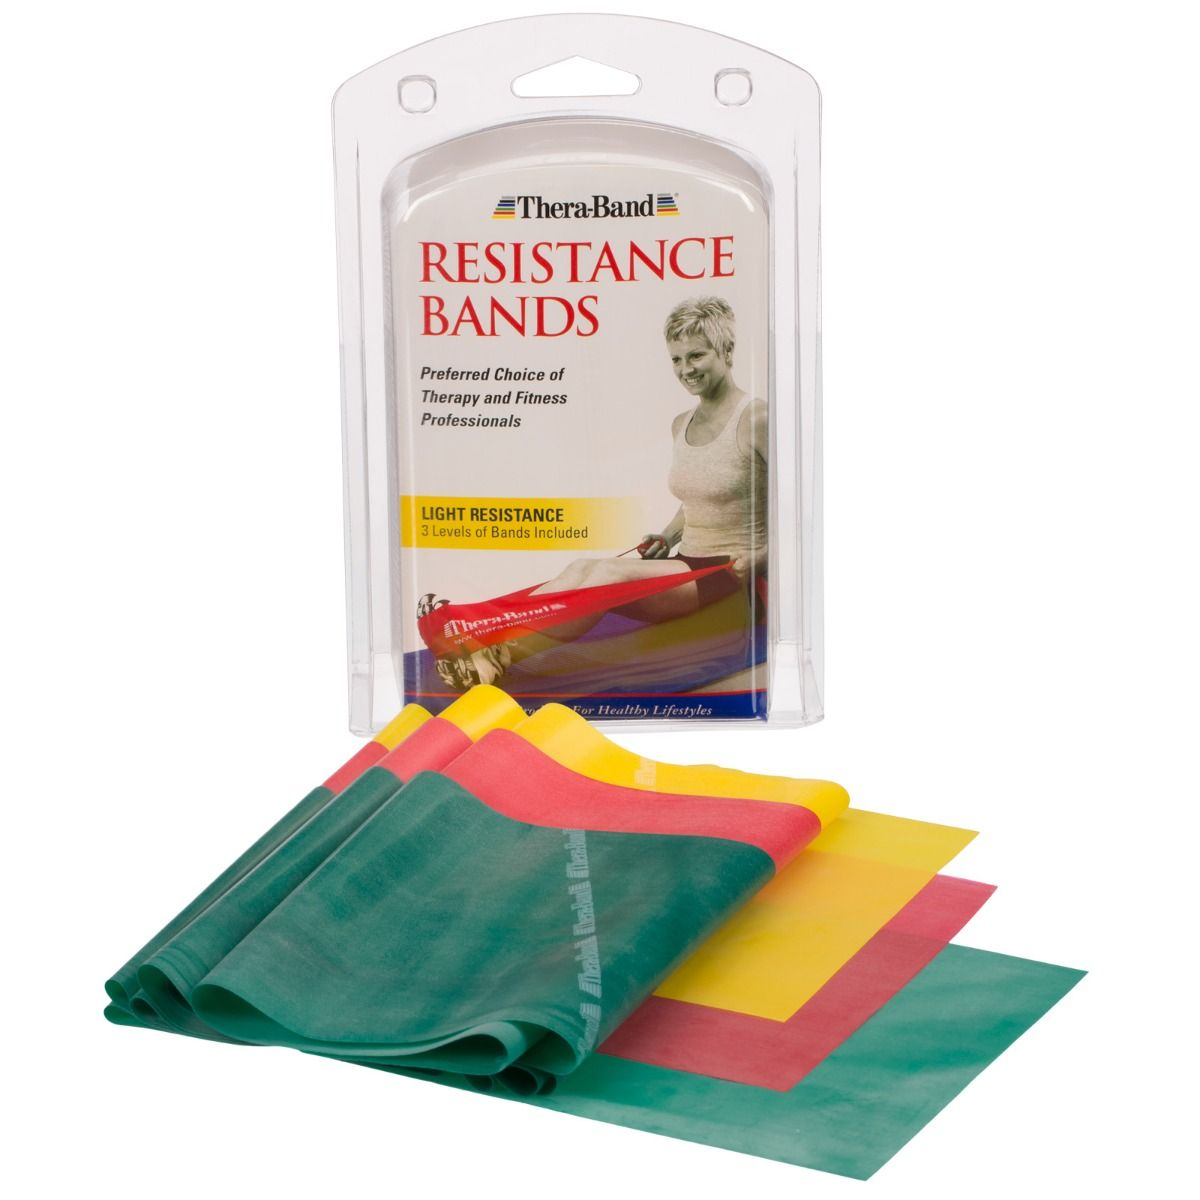 TheraBand Resistance Band Beginner Kit